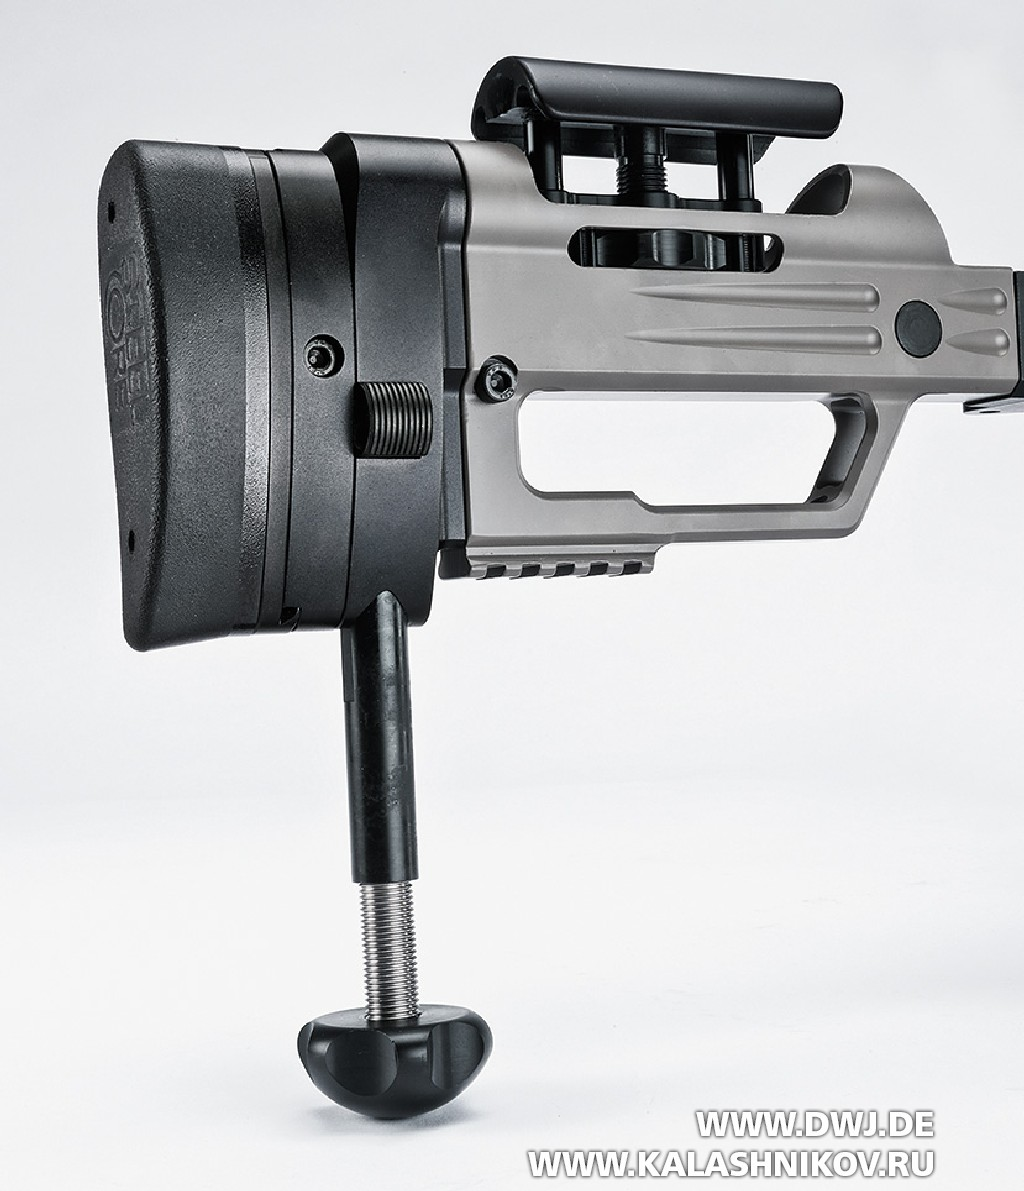 Высокоточная винтовка Steel Core Designs Cyclone калибра .308 Winchester. Приклад